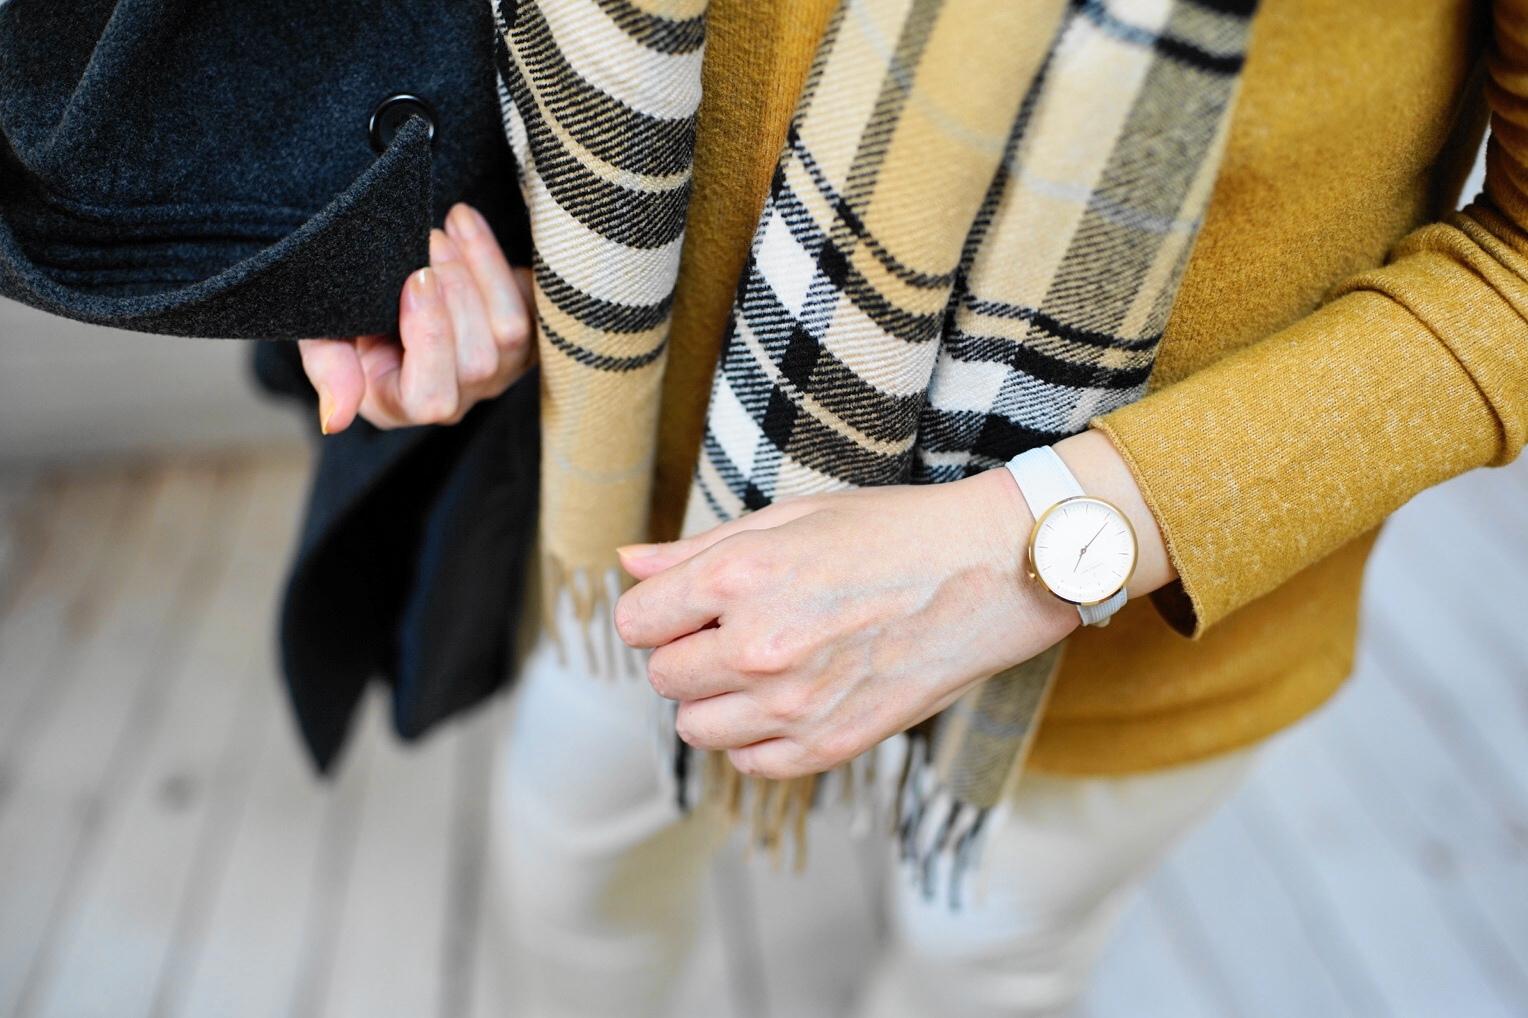 Nordgreen × Koyuki コラボストラップ 雪色ストラップ着用イメージ2